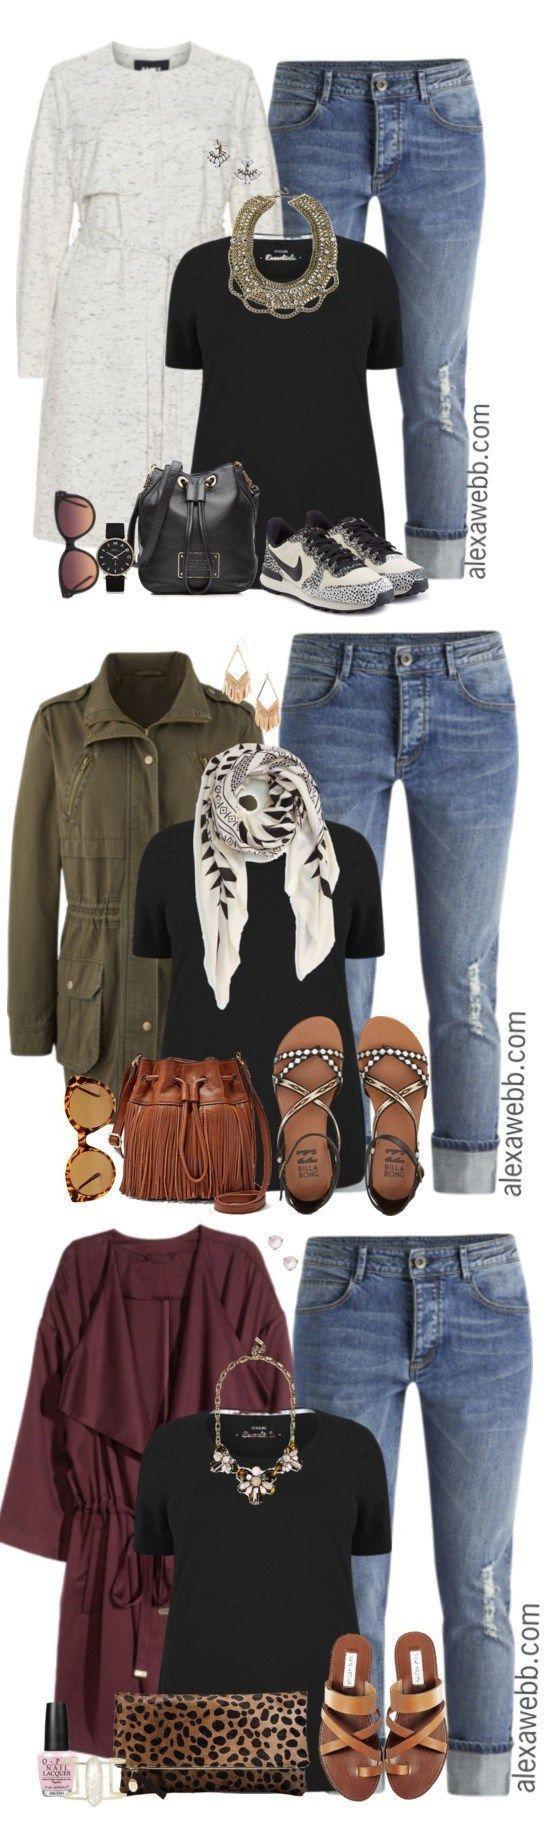 Plus Size Outfit Ideas - Plus Size Jeans and a Black Tee - Plus Size Fashion for Women - alexawebb.com #alexawebb #plus #size